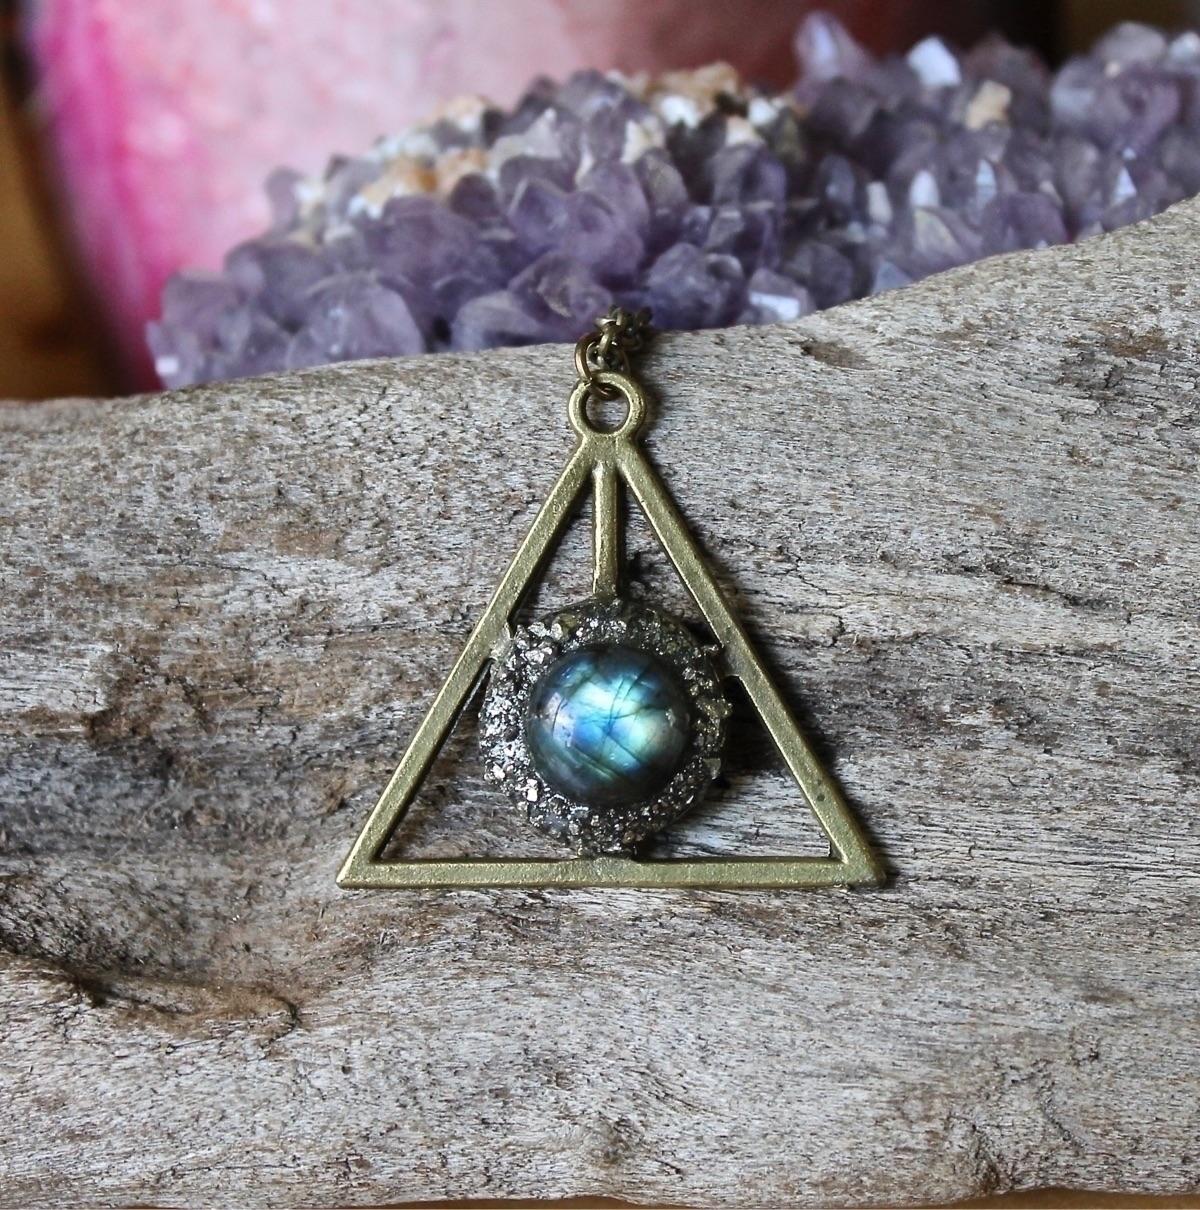 Stunning Labradorite Necklace - jewelry - adamfjgreen | ello